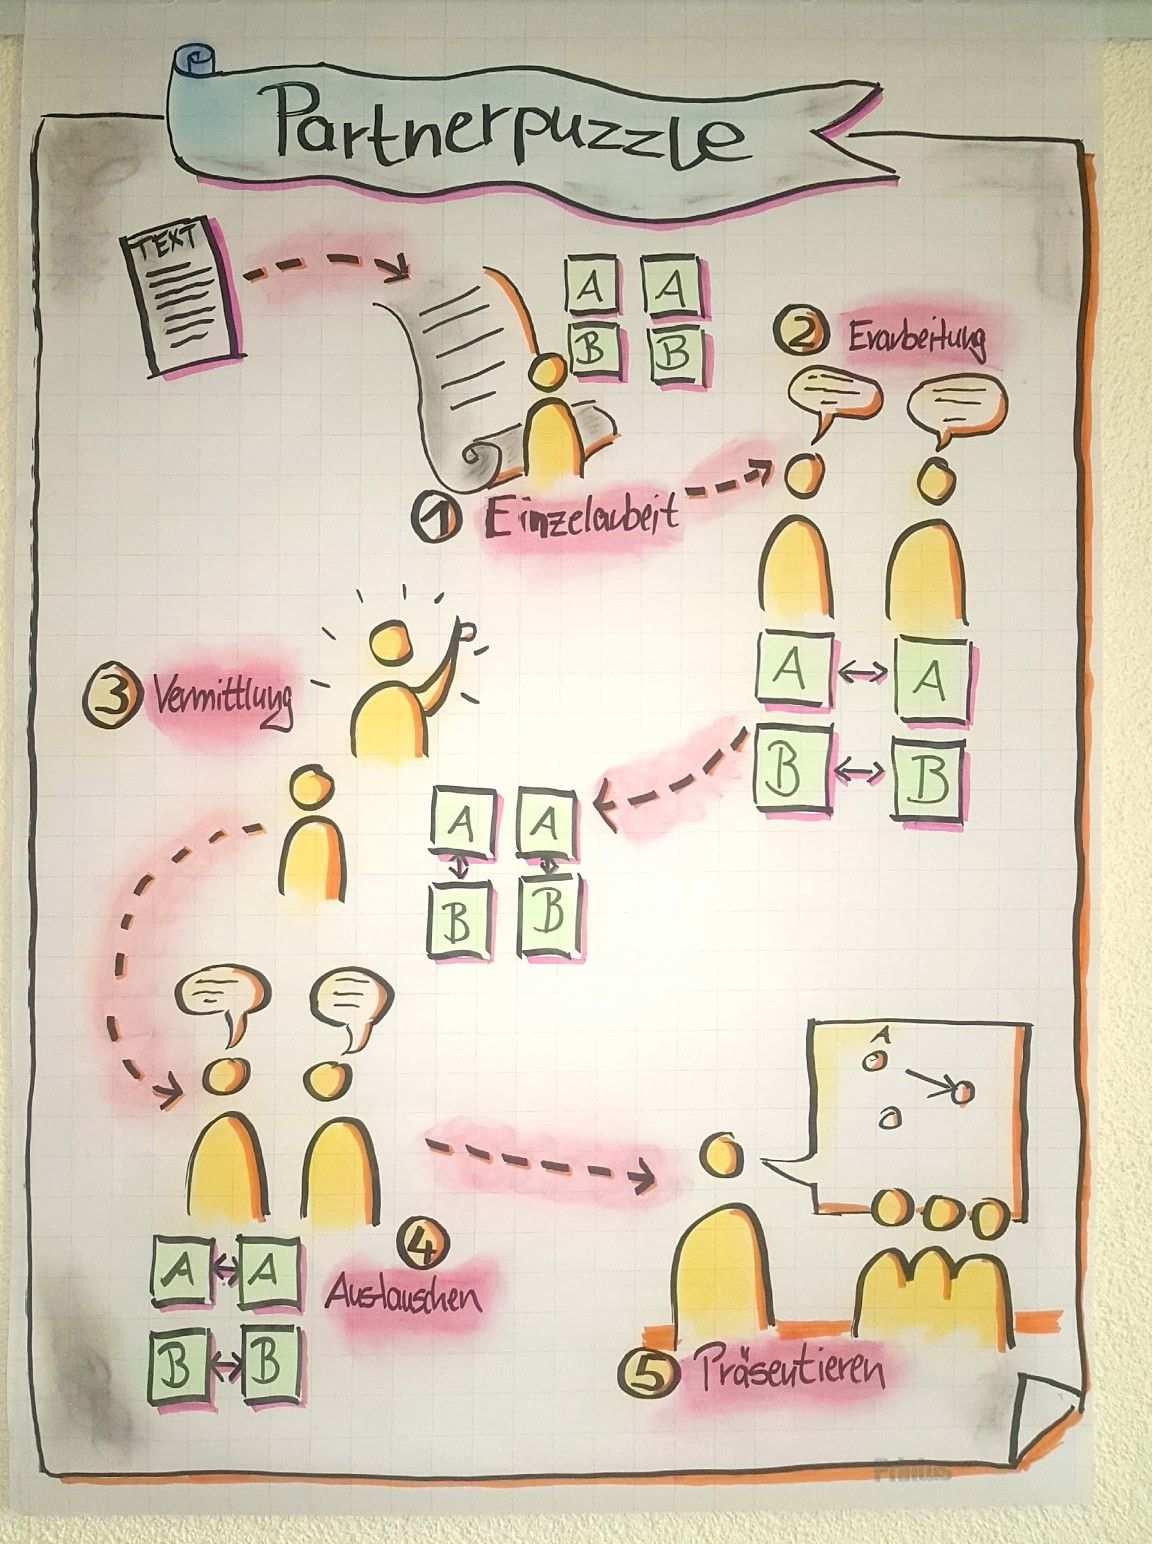 Flipchart Partnerpuzzle Kooperatives Lernen Schule Kooperatives Lernen Kreativer Unterricht Unterrichtsmethoden